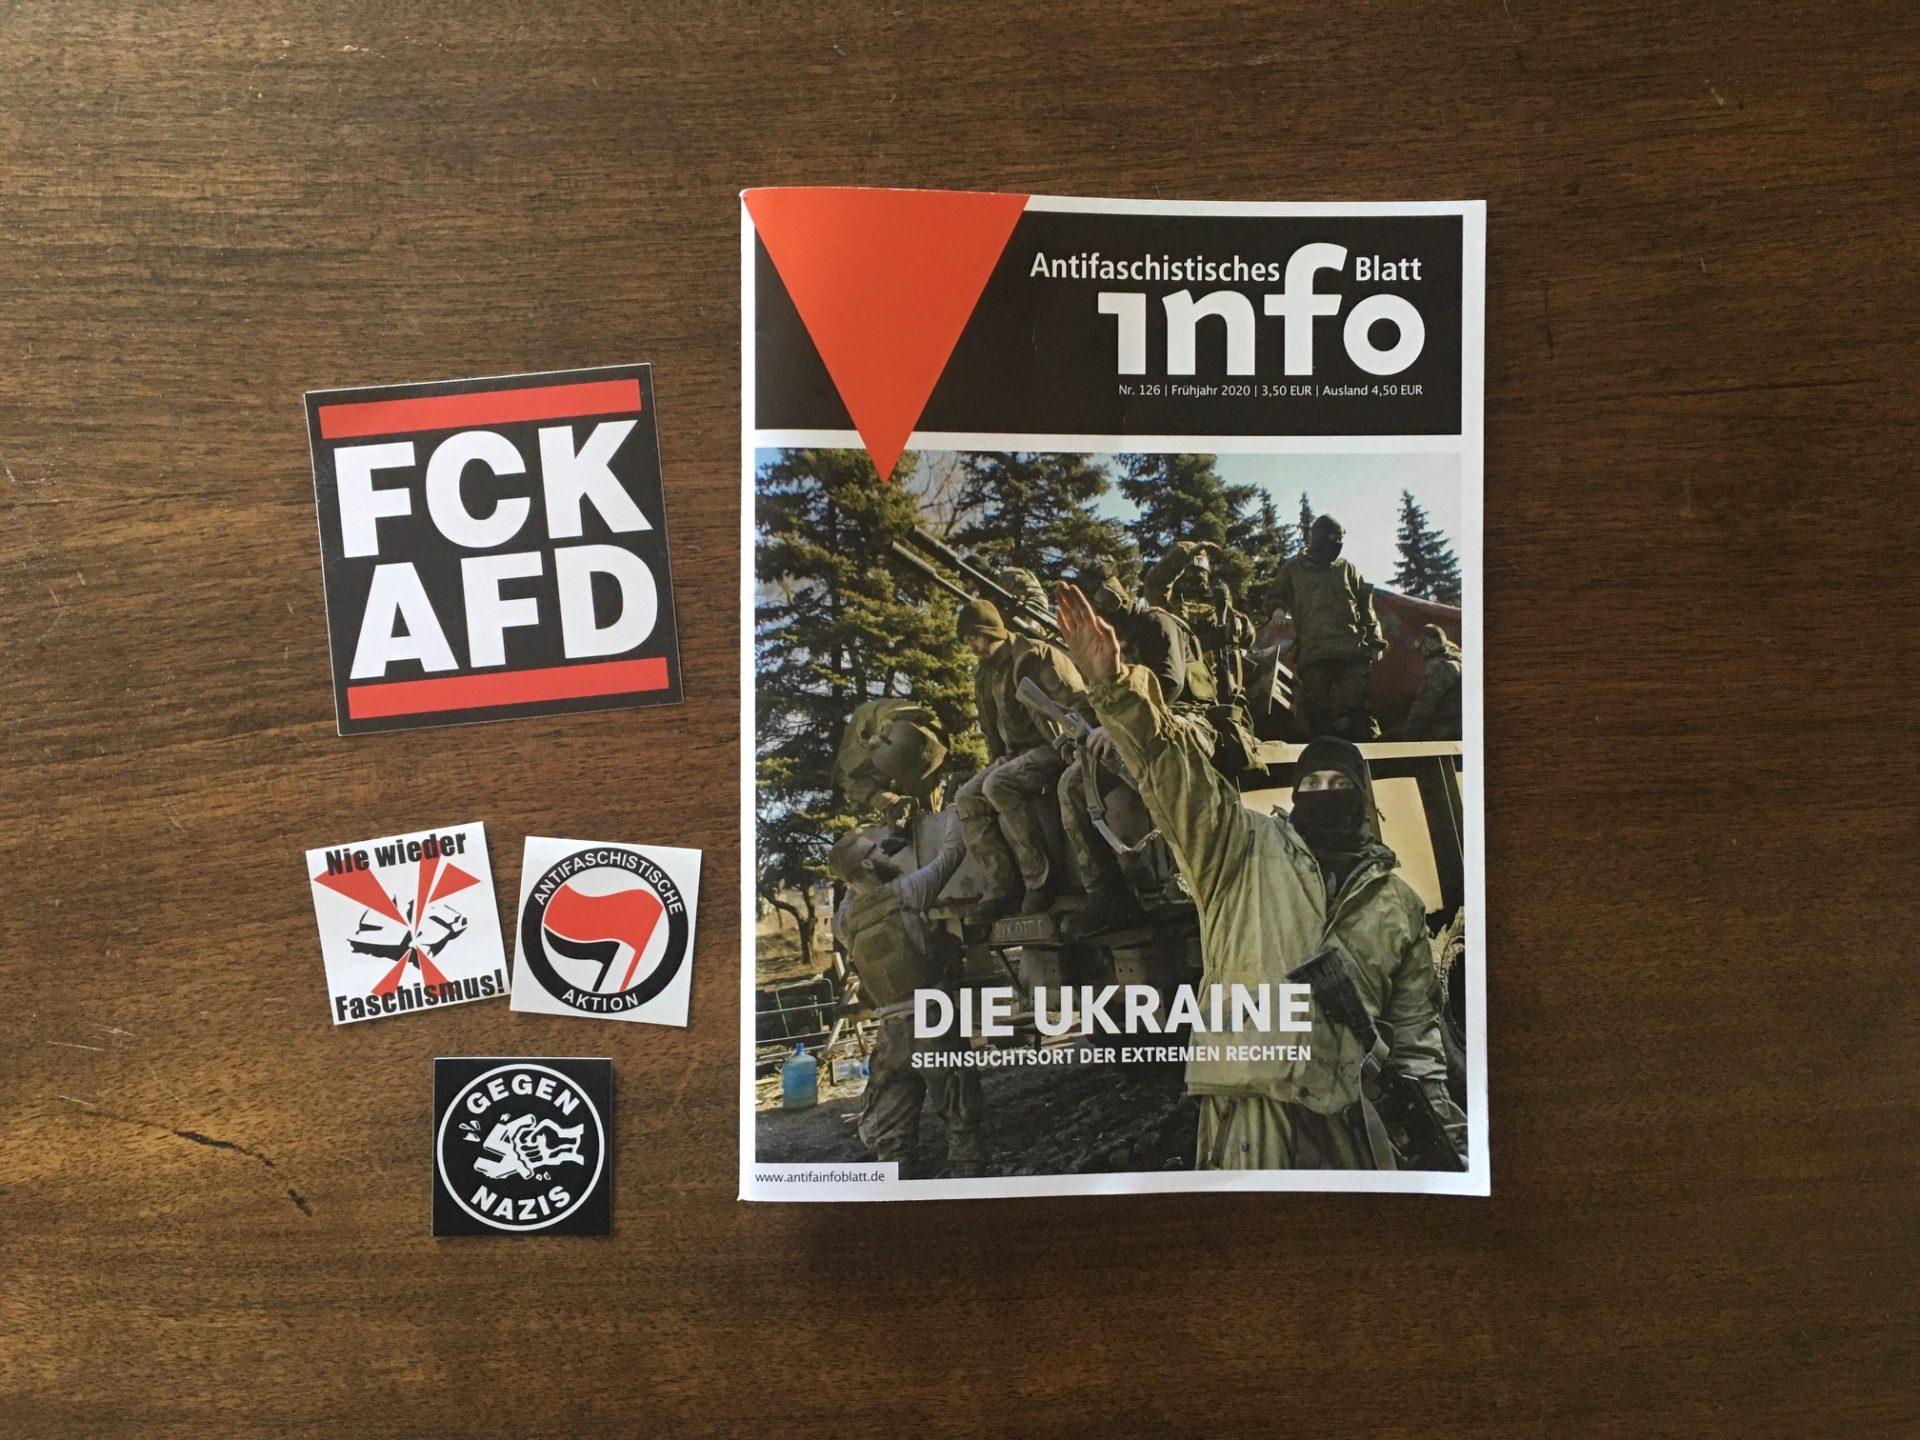 Antifaschistisches Info Blatt 126